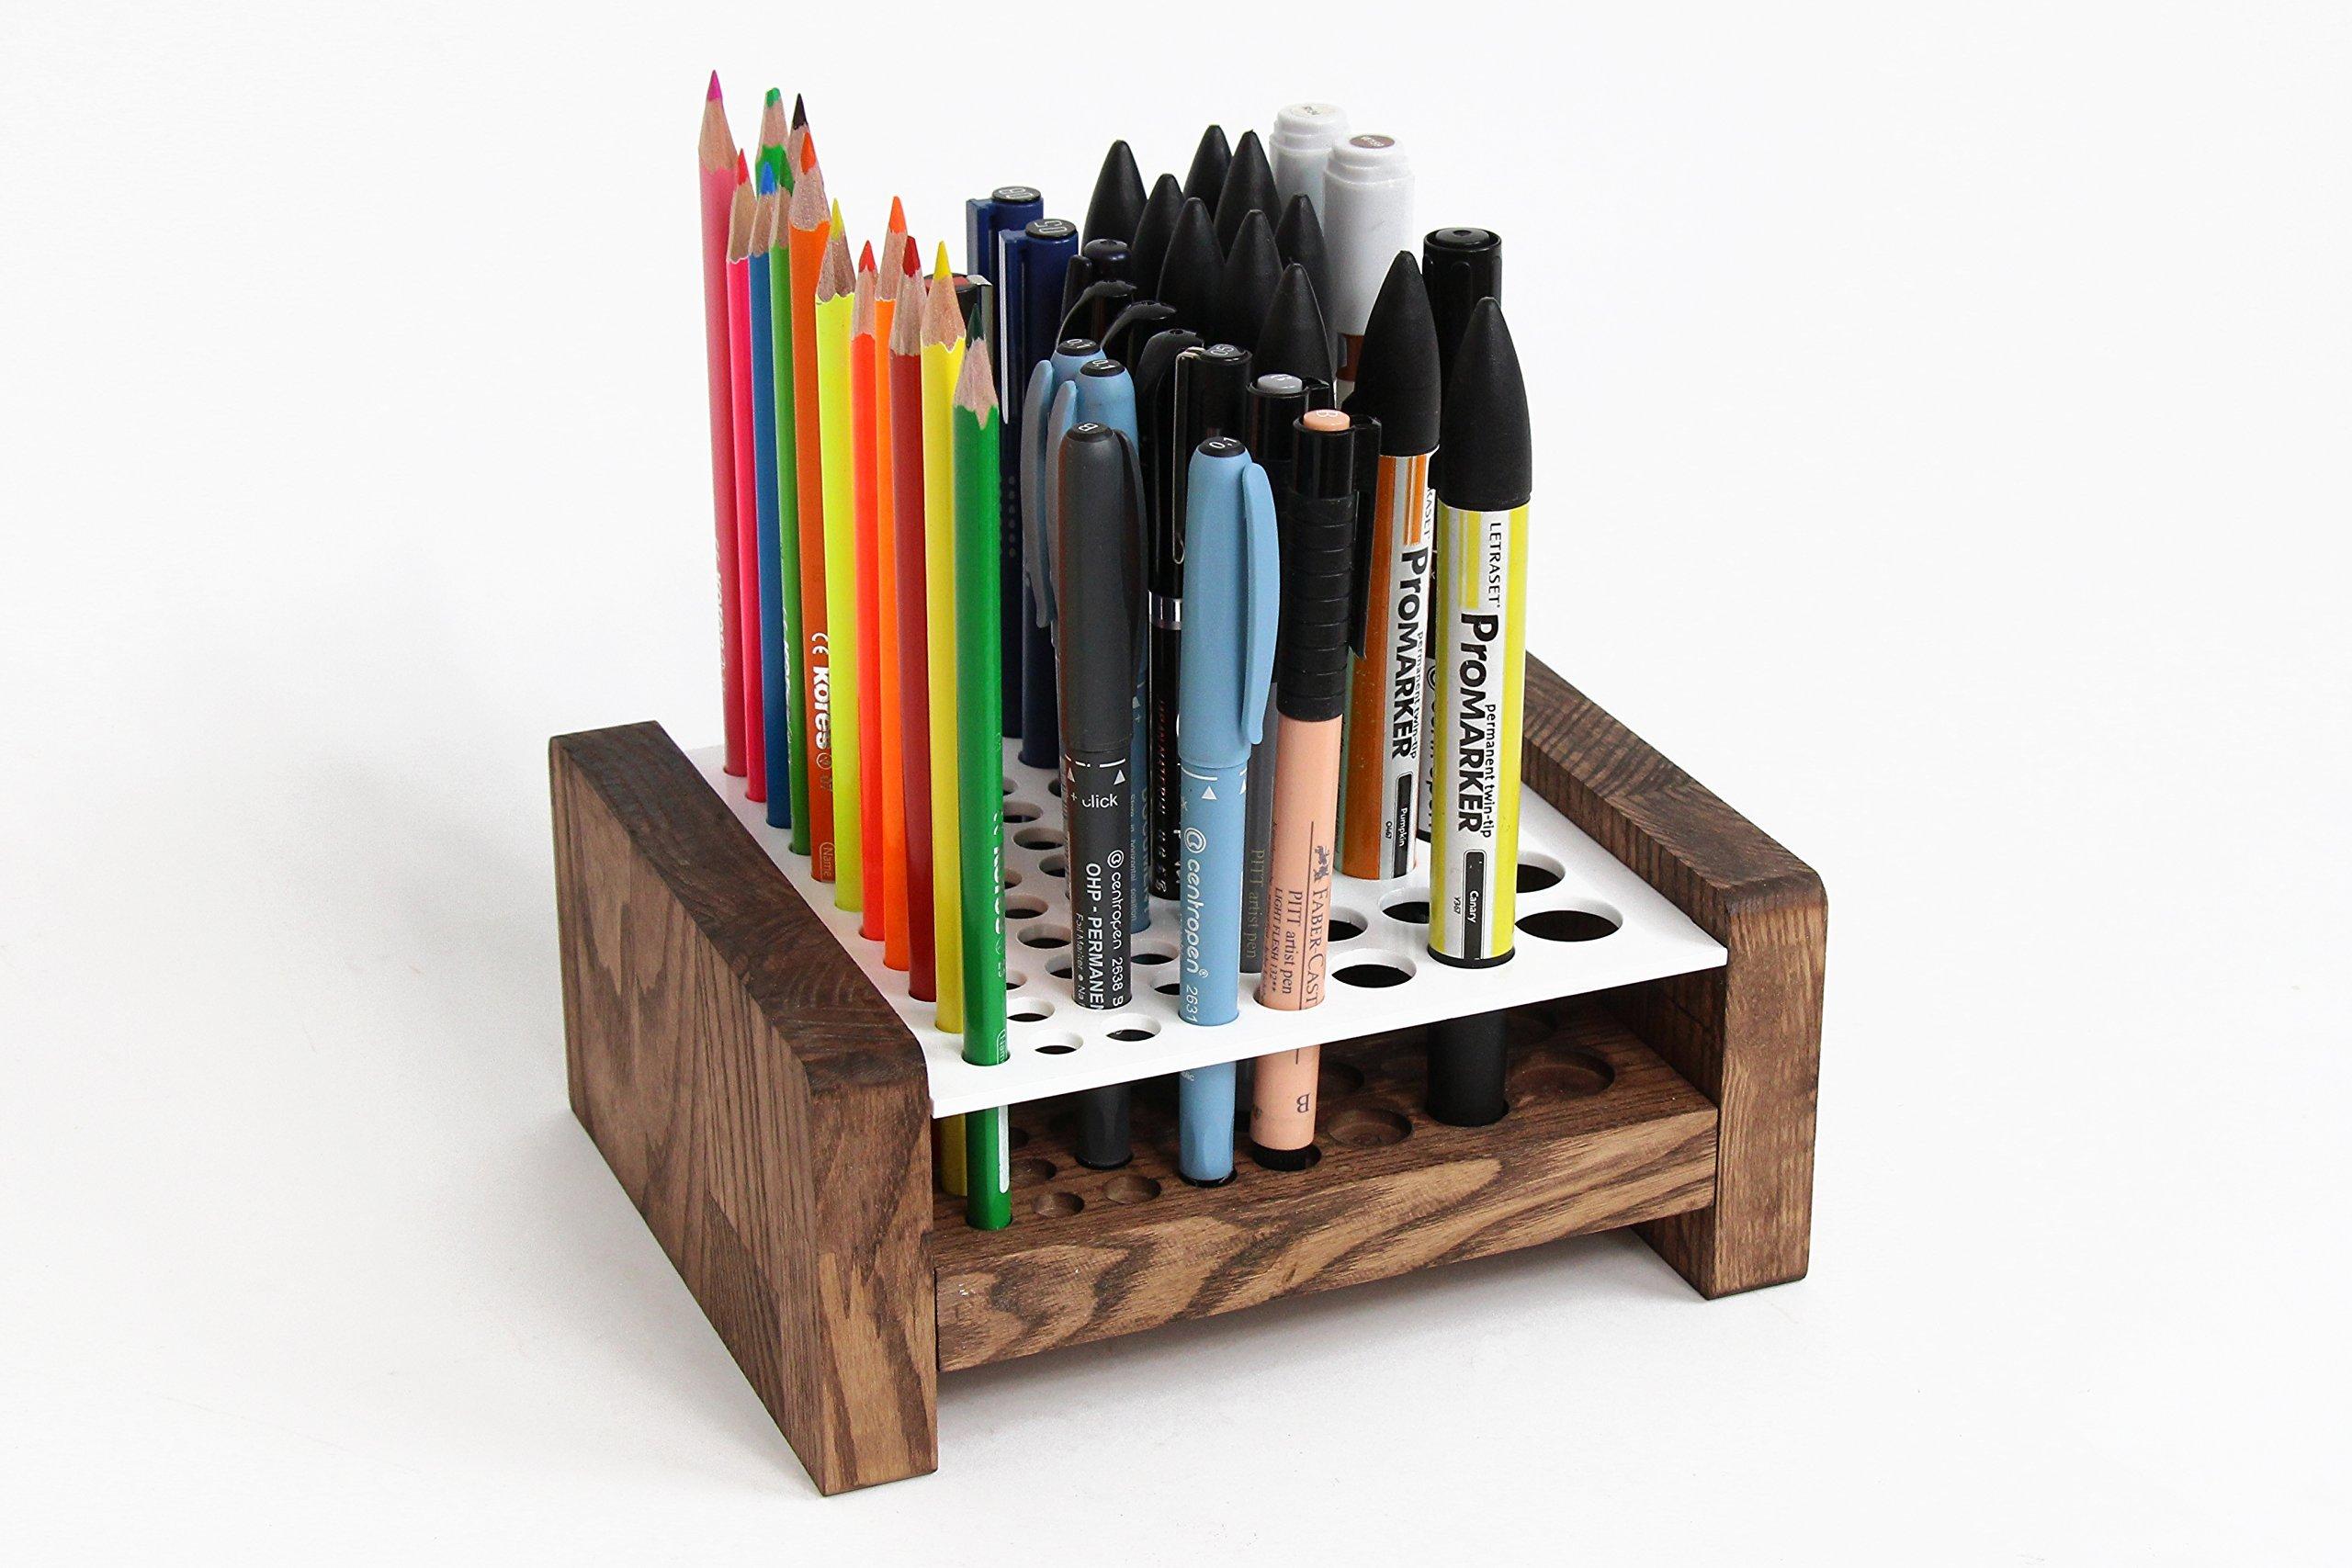 Pen Holder, Pencil Holder, Desk Accessories, Desk Organizer, Office Accessories, Makeup Brush Holder, Brush Holder, Pencil Cup, Pen Stand